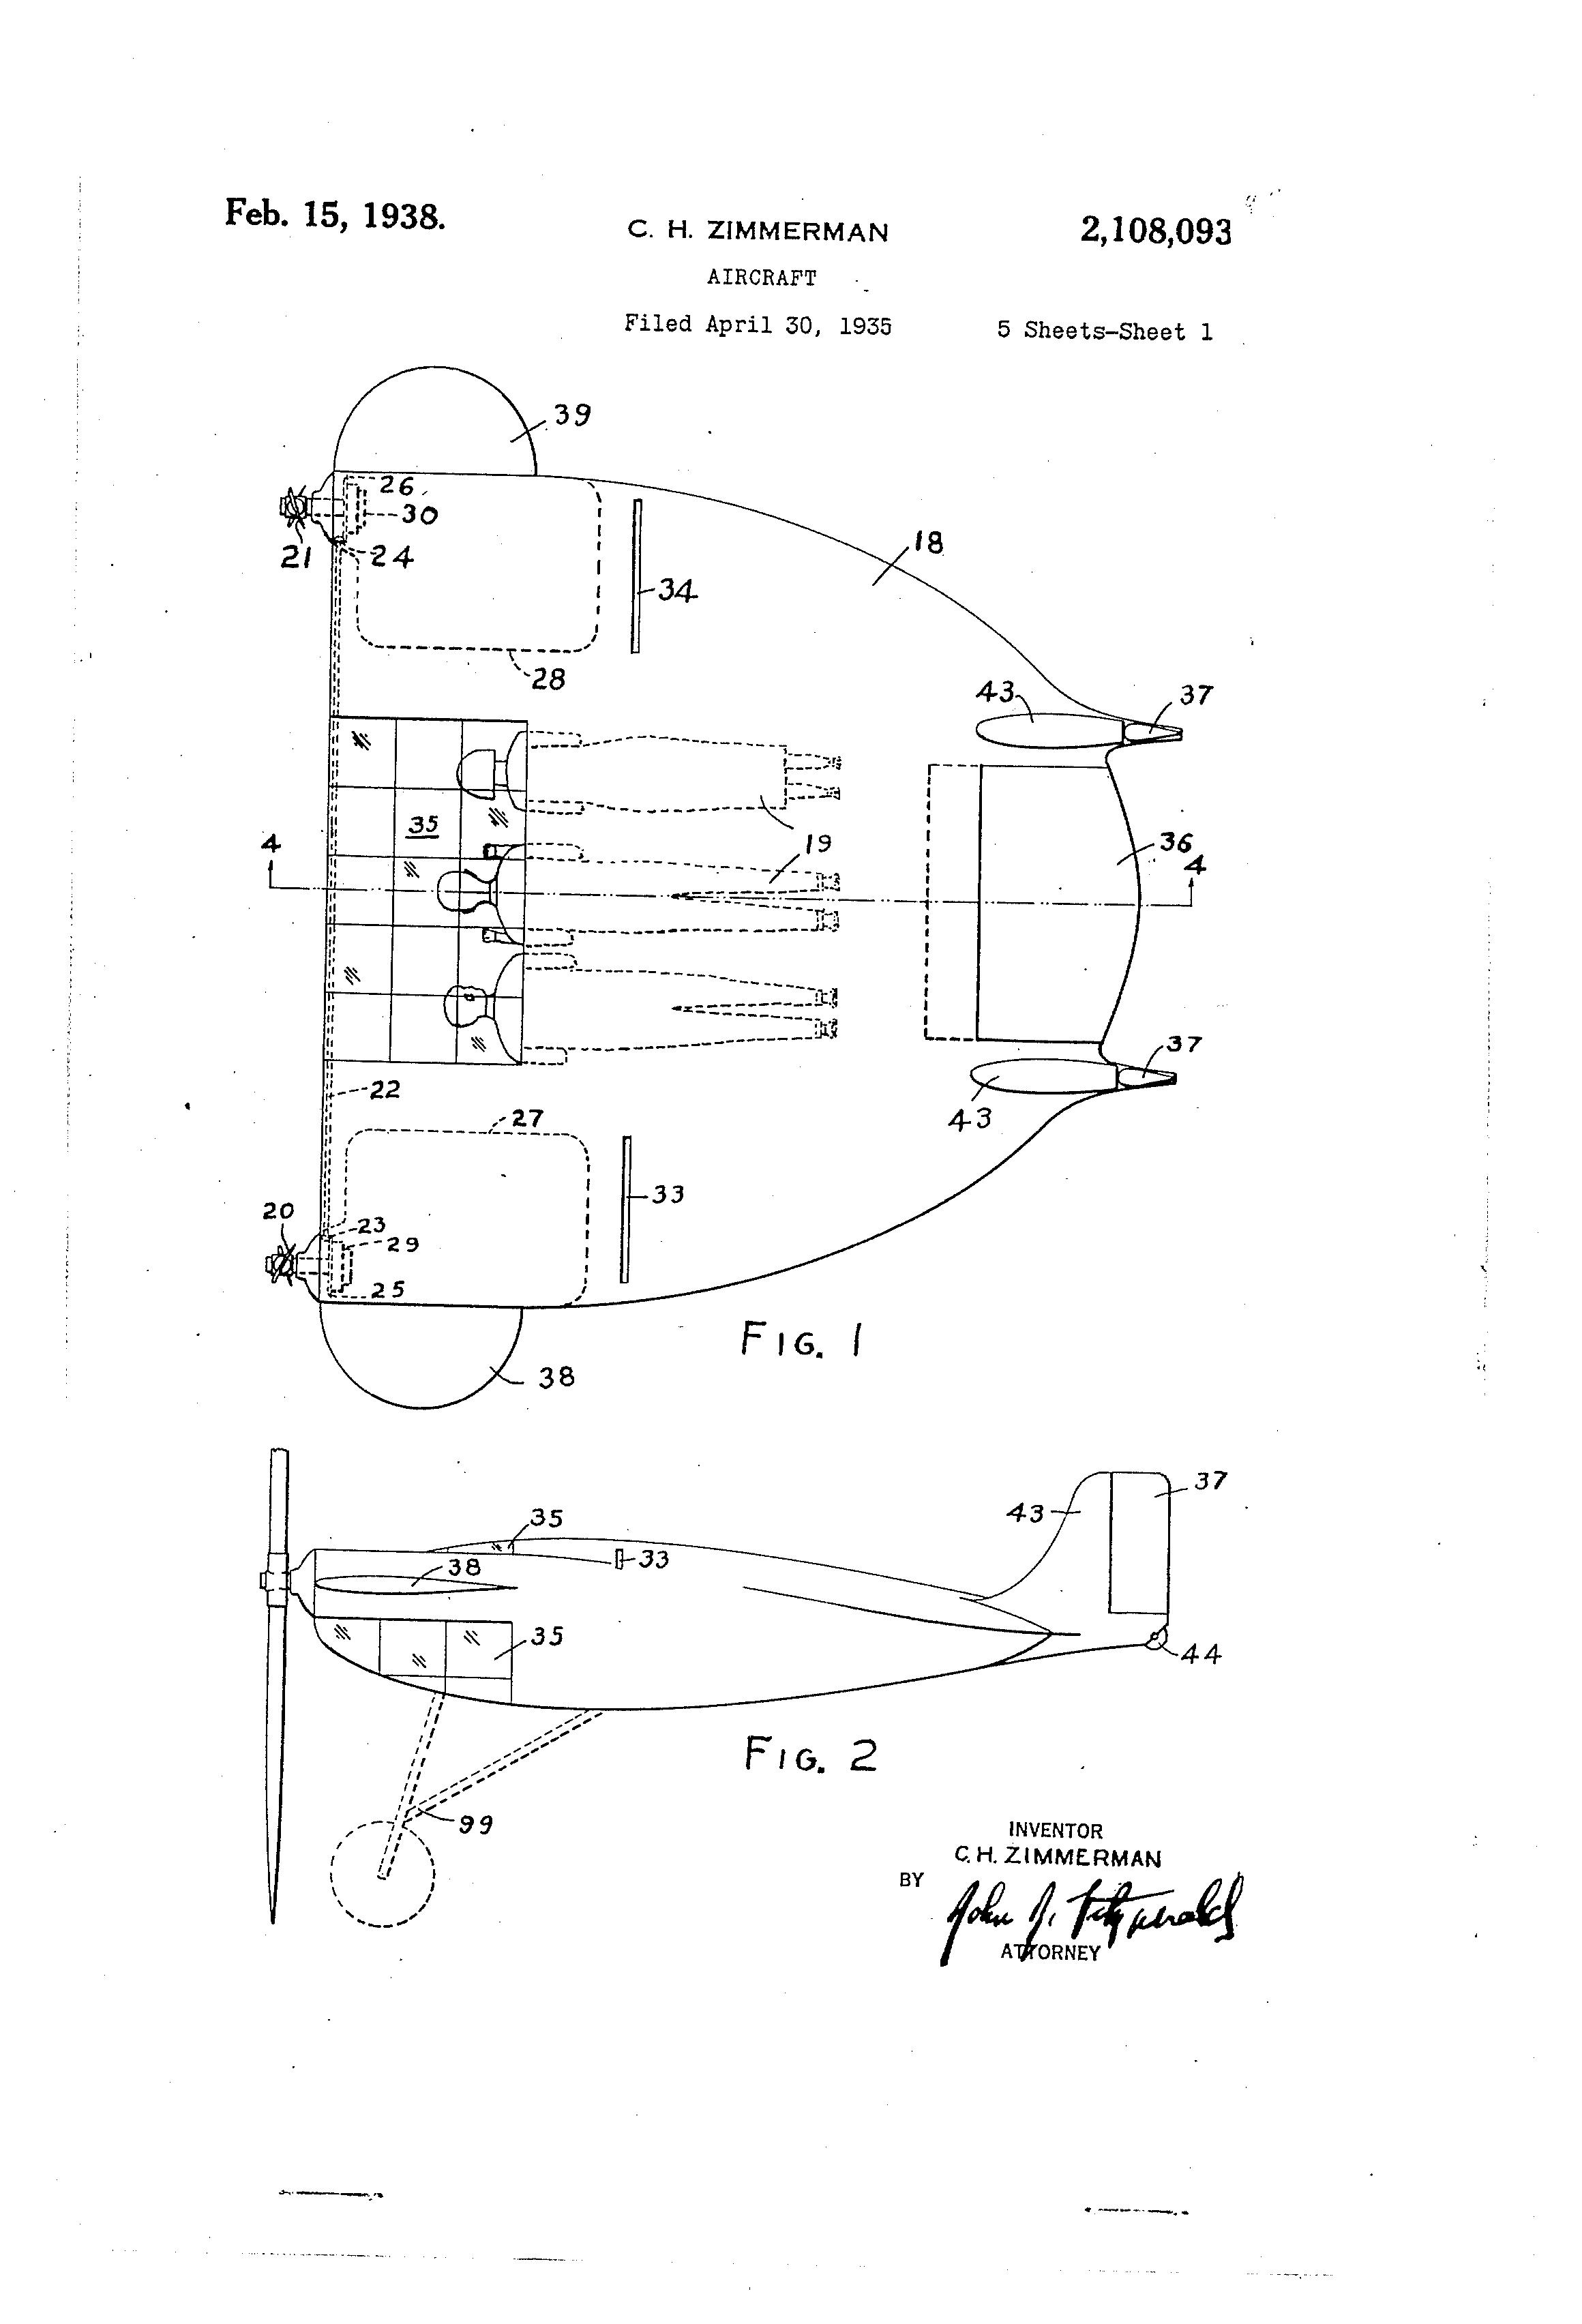 cessna 406 diagram 2004 nissan 350z bose radio wiring bush plane schematics zimmerman patent drawing aviation pinterest rh com with floats